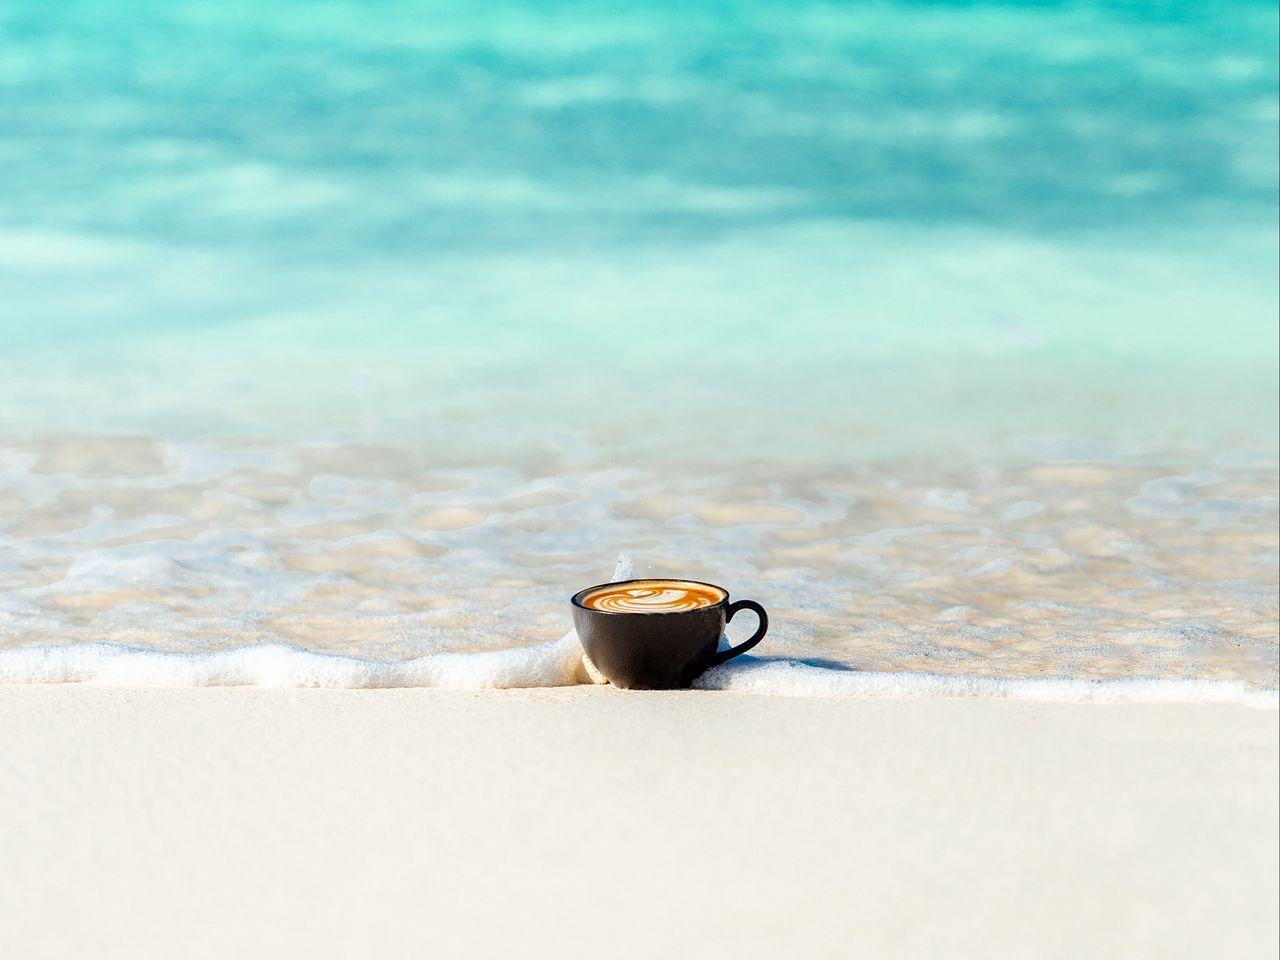 1280x960 Wallpaper cup, ocean, sand, coast, minimalism